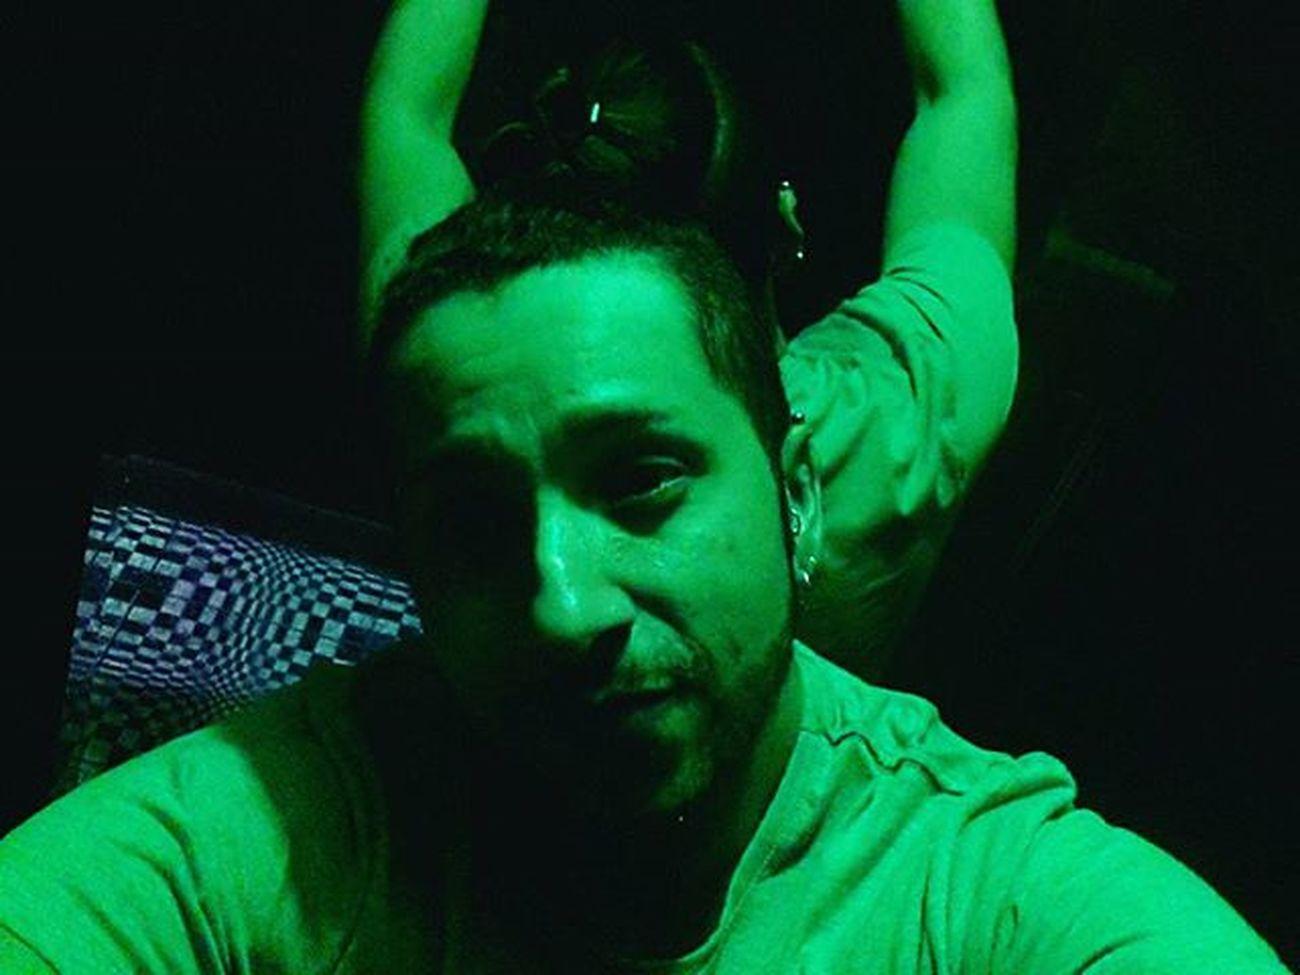 Esse banheiro é doido...kkkkkkkkkkkkk Instagram Amigos Party Domingão Domingodesol Bebedeira Alcool  Cerveja Breja Beer Blackwhite Blackandwhite Me Myself Selfie Terracodoleo Freicaneca Terracodoleo Saopaulo SP Saooutrospaulos Green